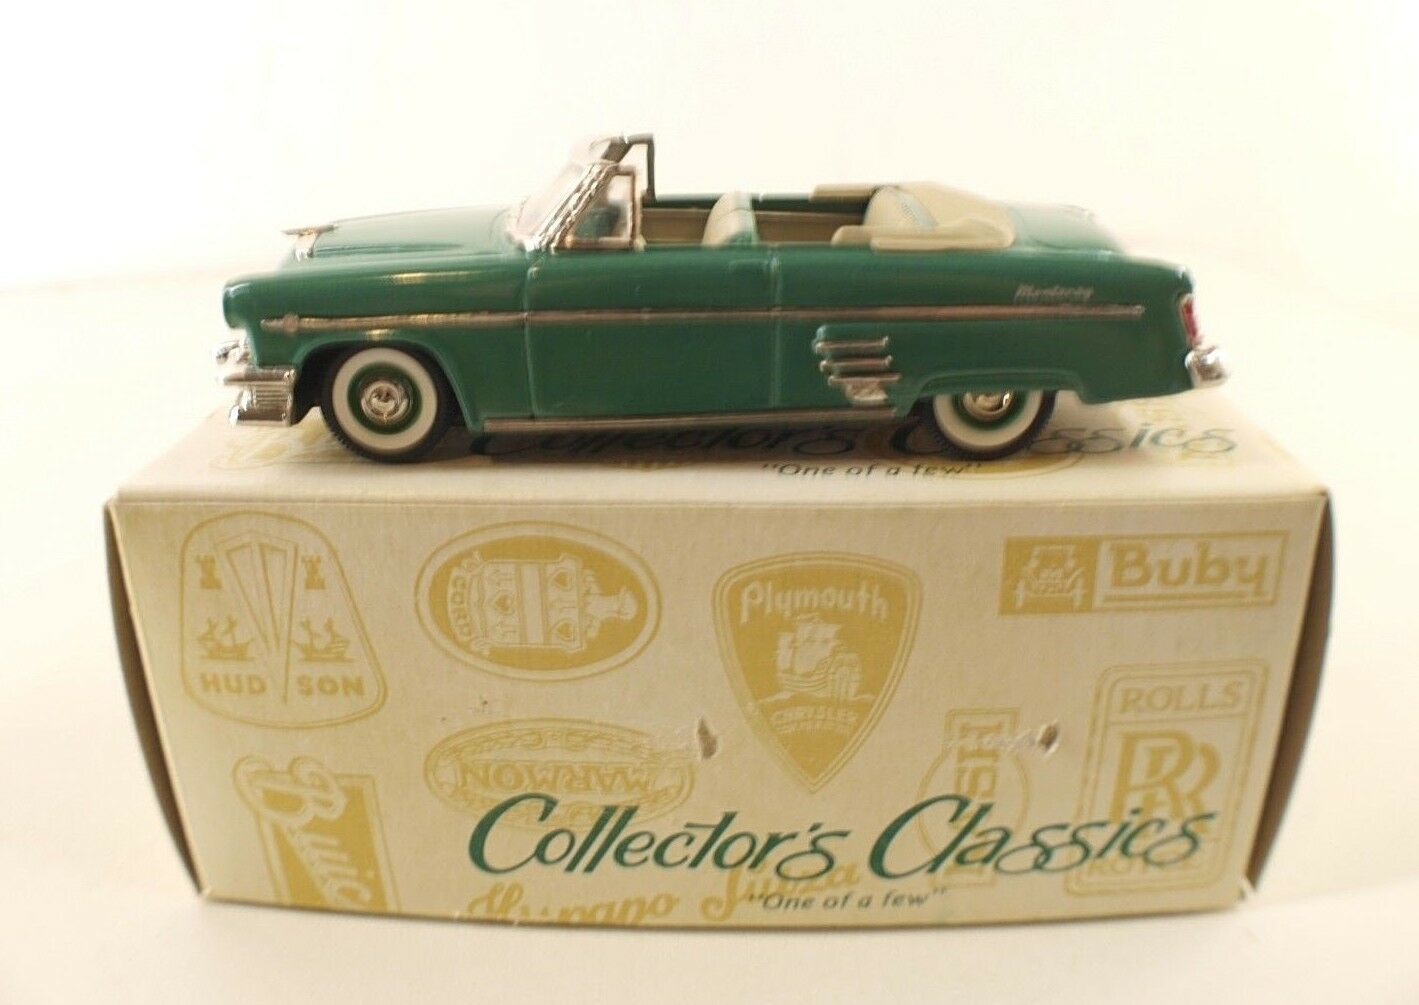 Collector's Klassisch Silberinien Nr. C1-3D0 Mercury Monterey Cabriolet 54 1 43